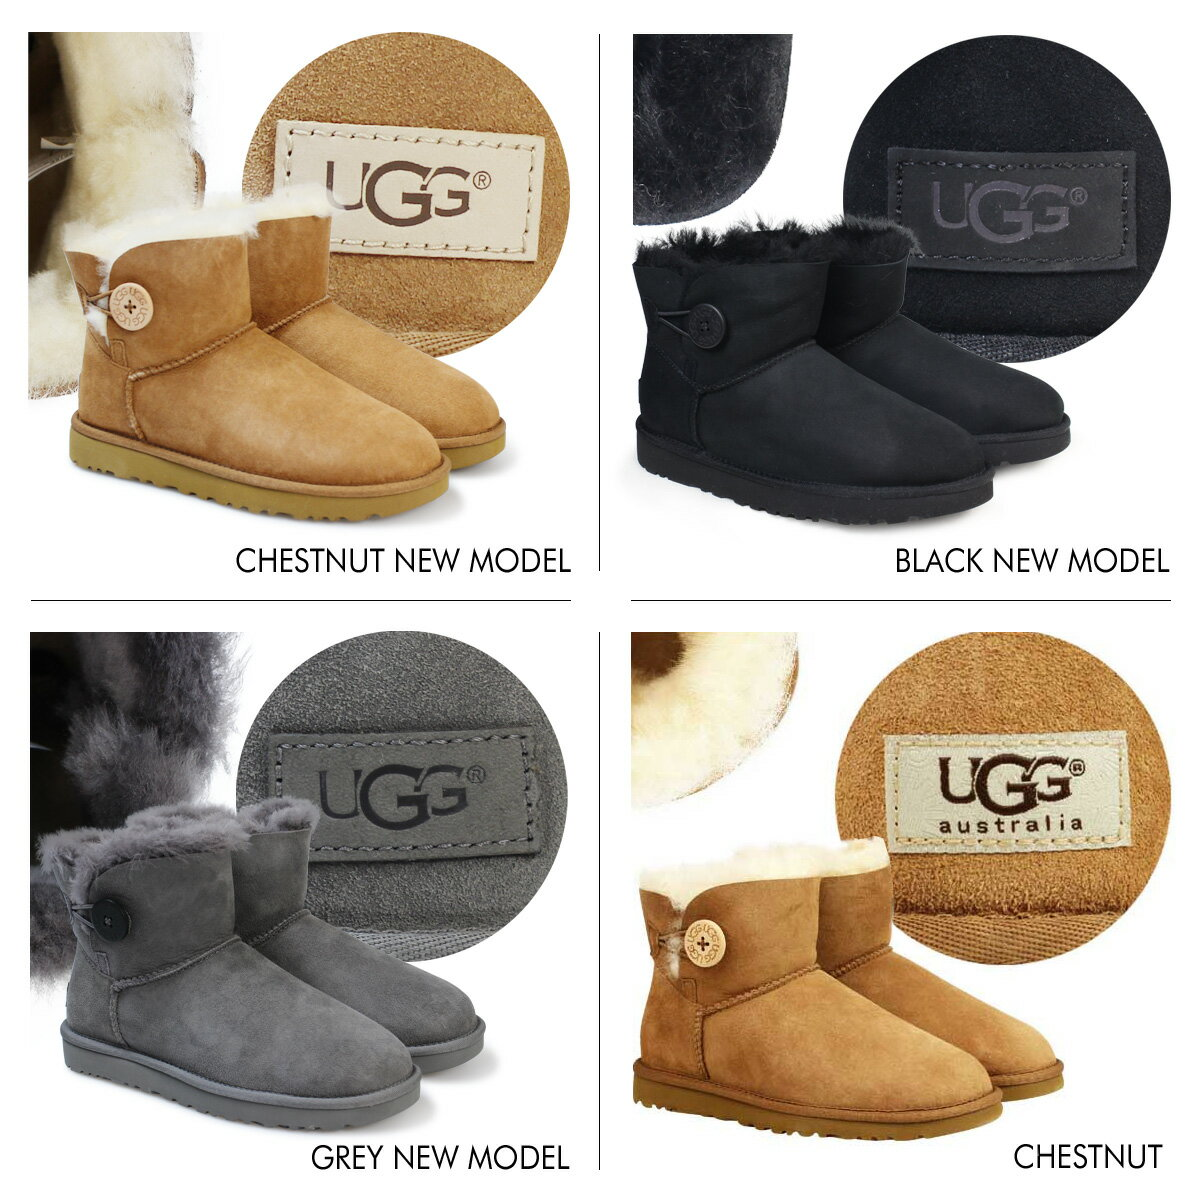 uggs 3352 for sale queens rh sutcliffechiro com